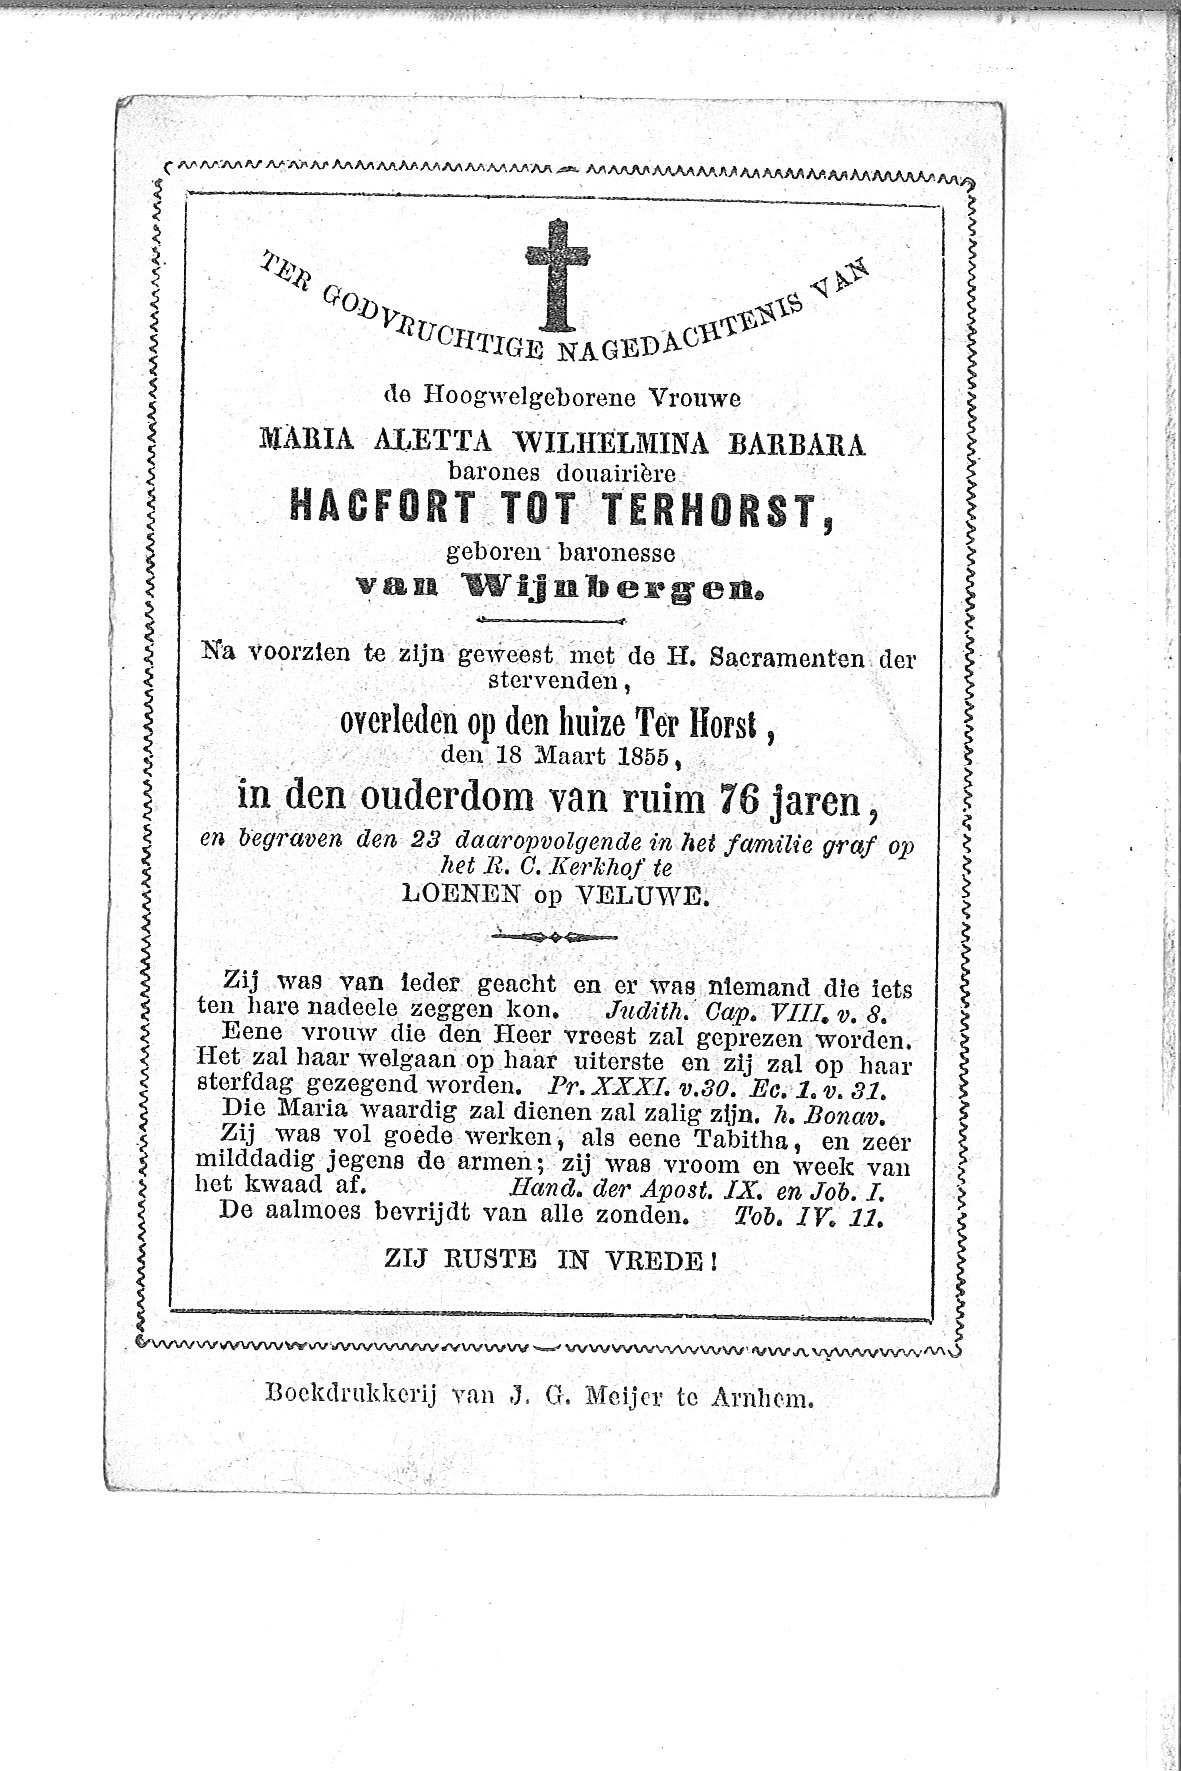 Maria-Aletta-Wilhelmina-Barbara-(1855)-20121116115219_00010.jpg